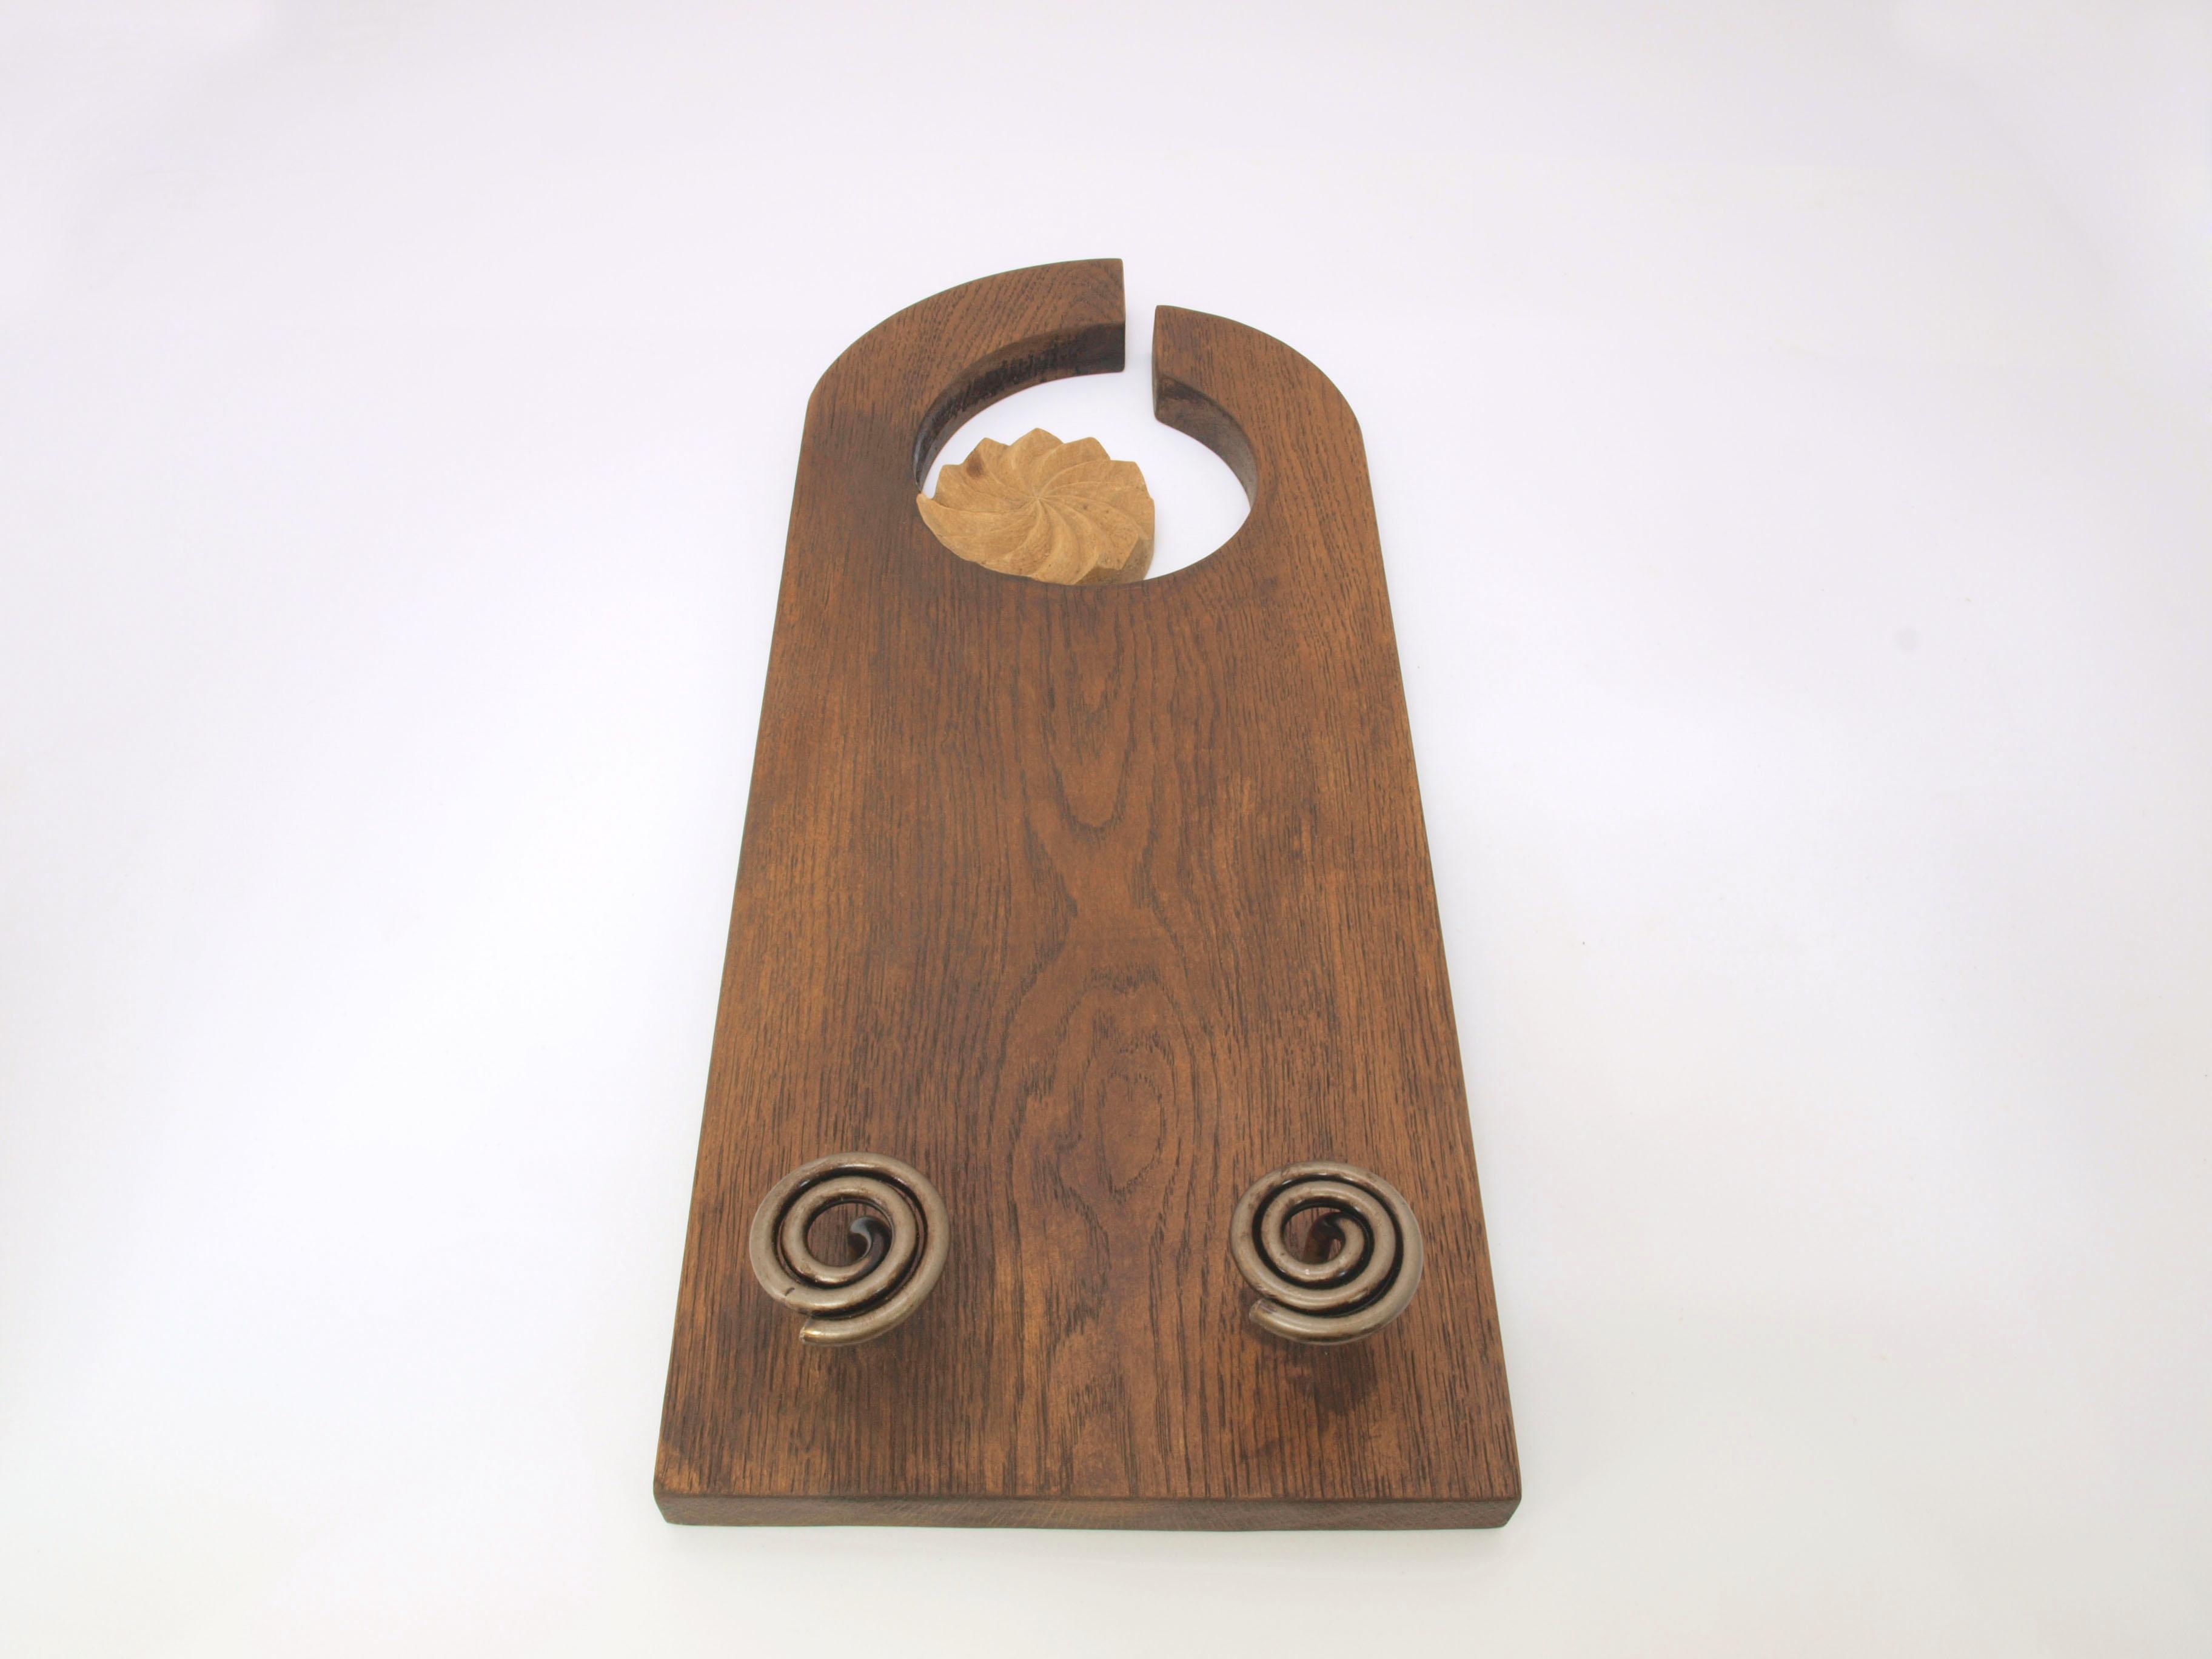 Perchero con estela tallado en madera de roble